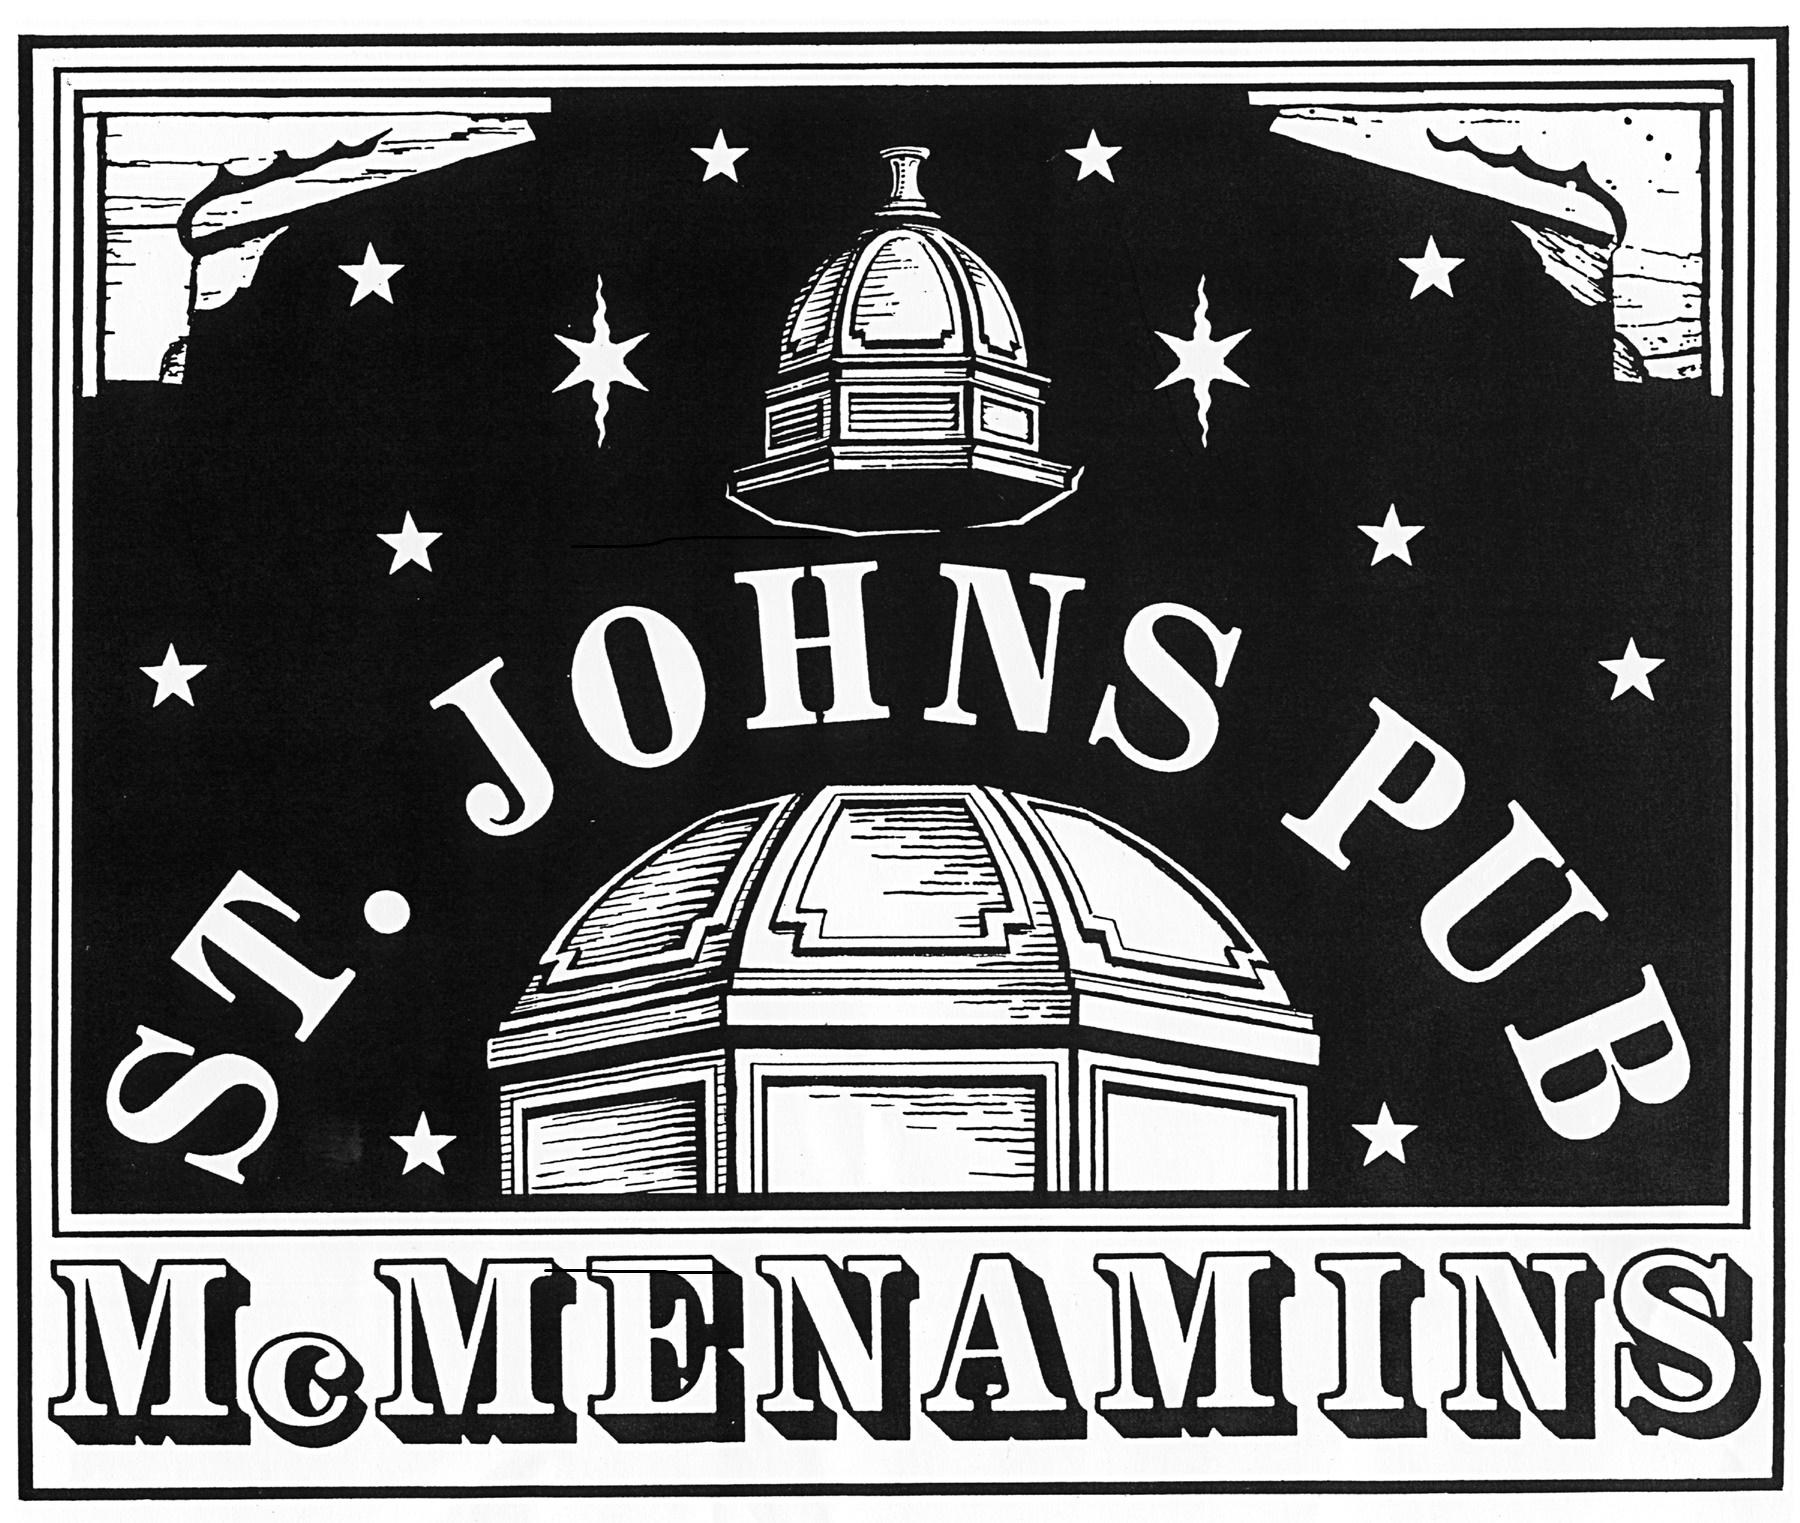 mcmenamins st john's logo.jpg